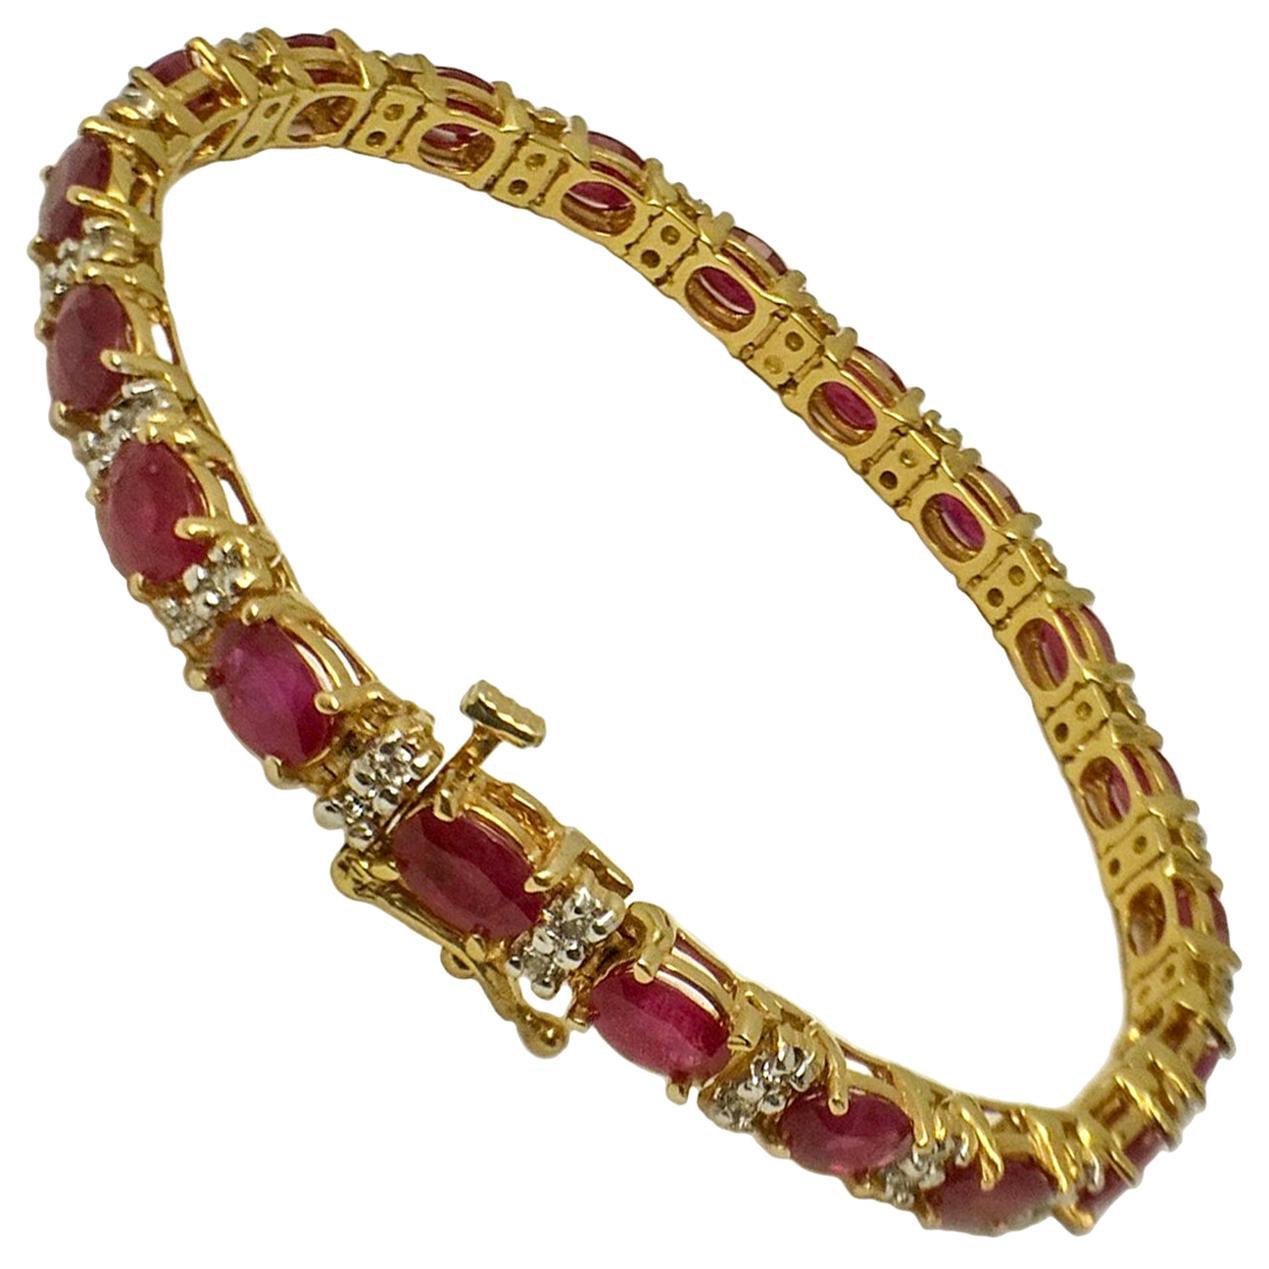 11 Carat Ruby Yellow Gold Bracelet Bangle